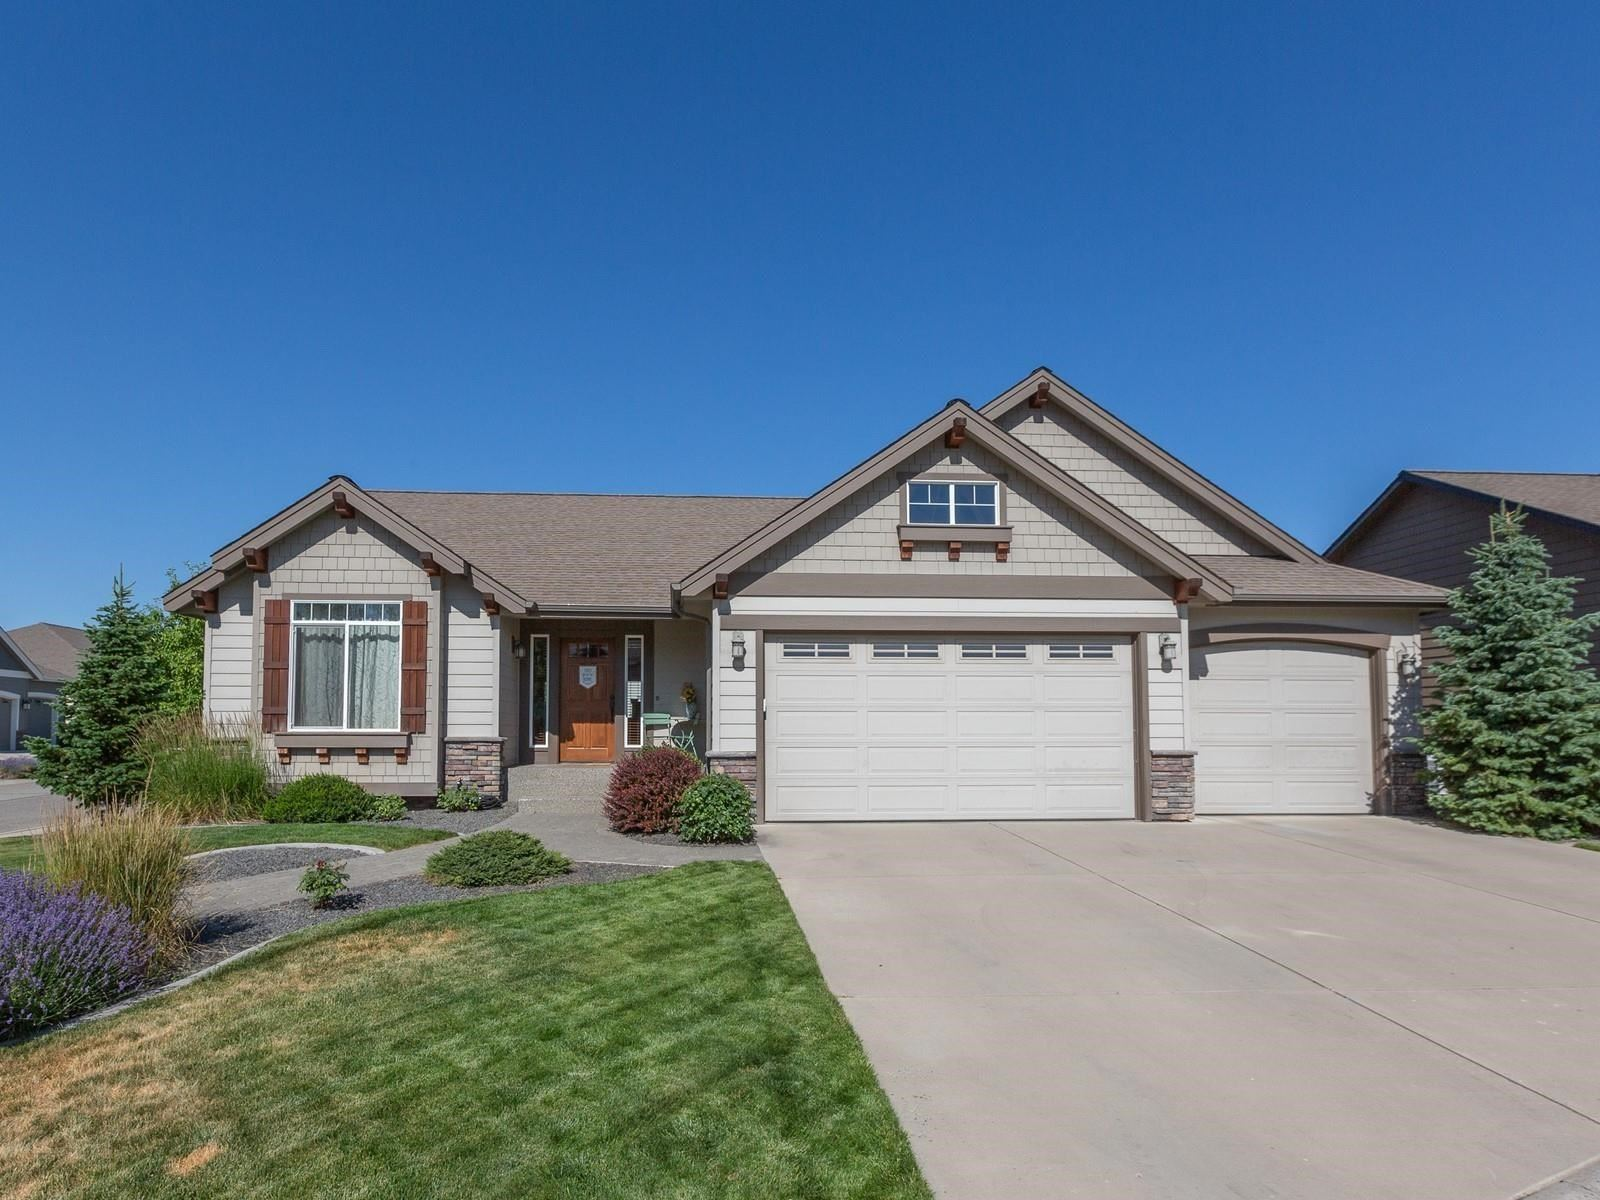 4430 S Mitchell Ln, Spokane, WA 99223-5091 - #: 202118429